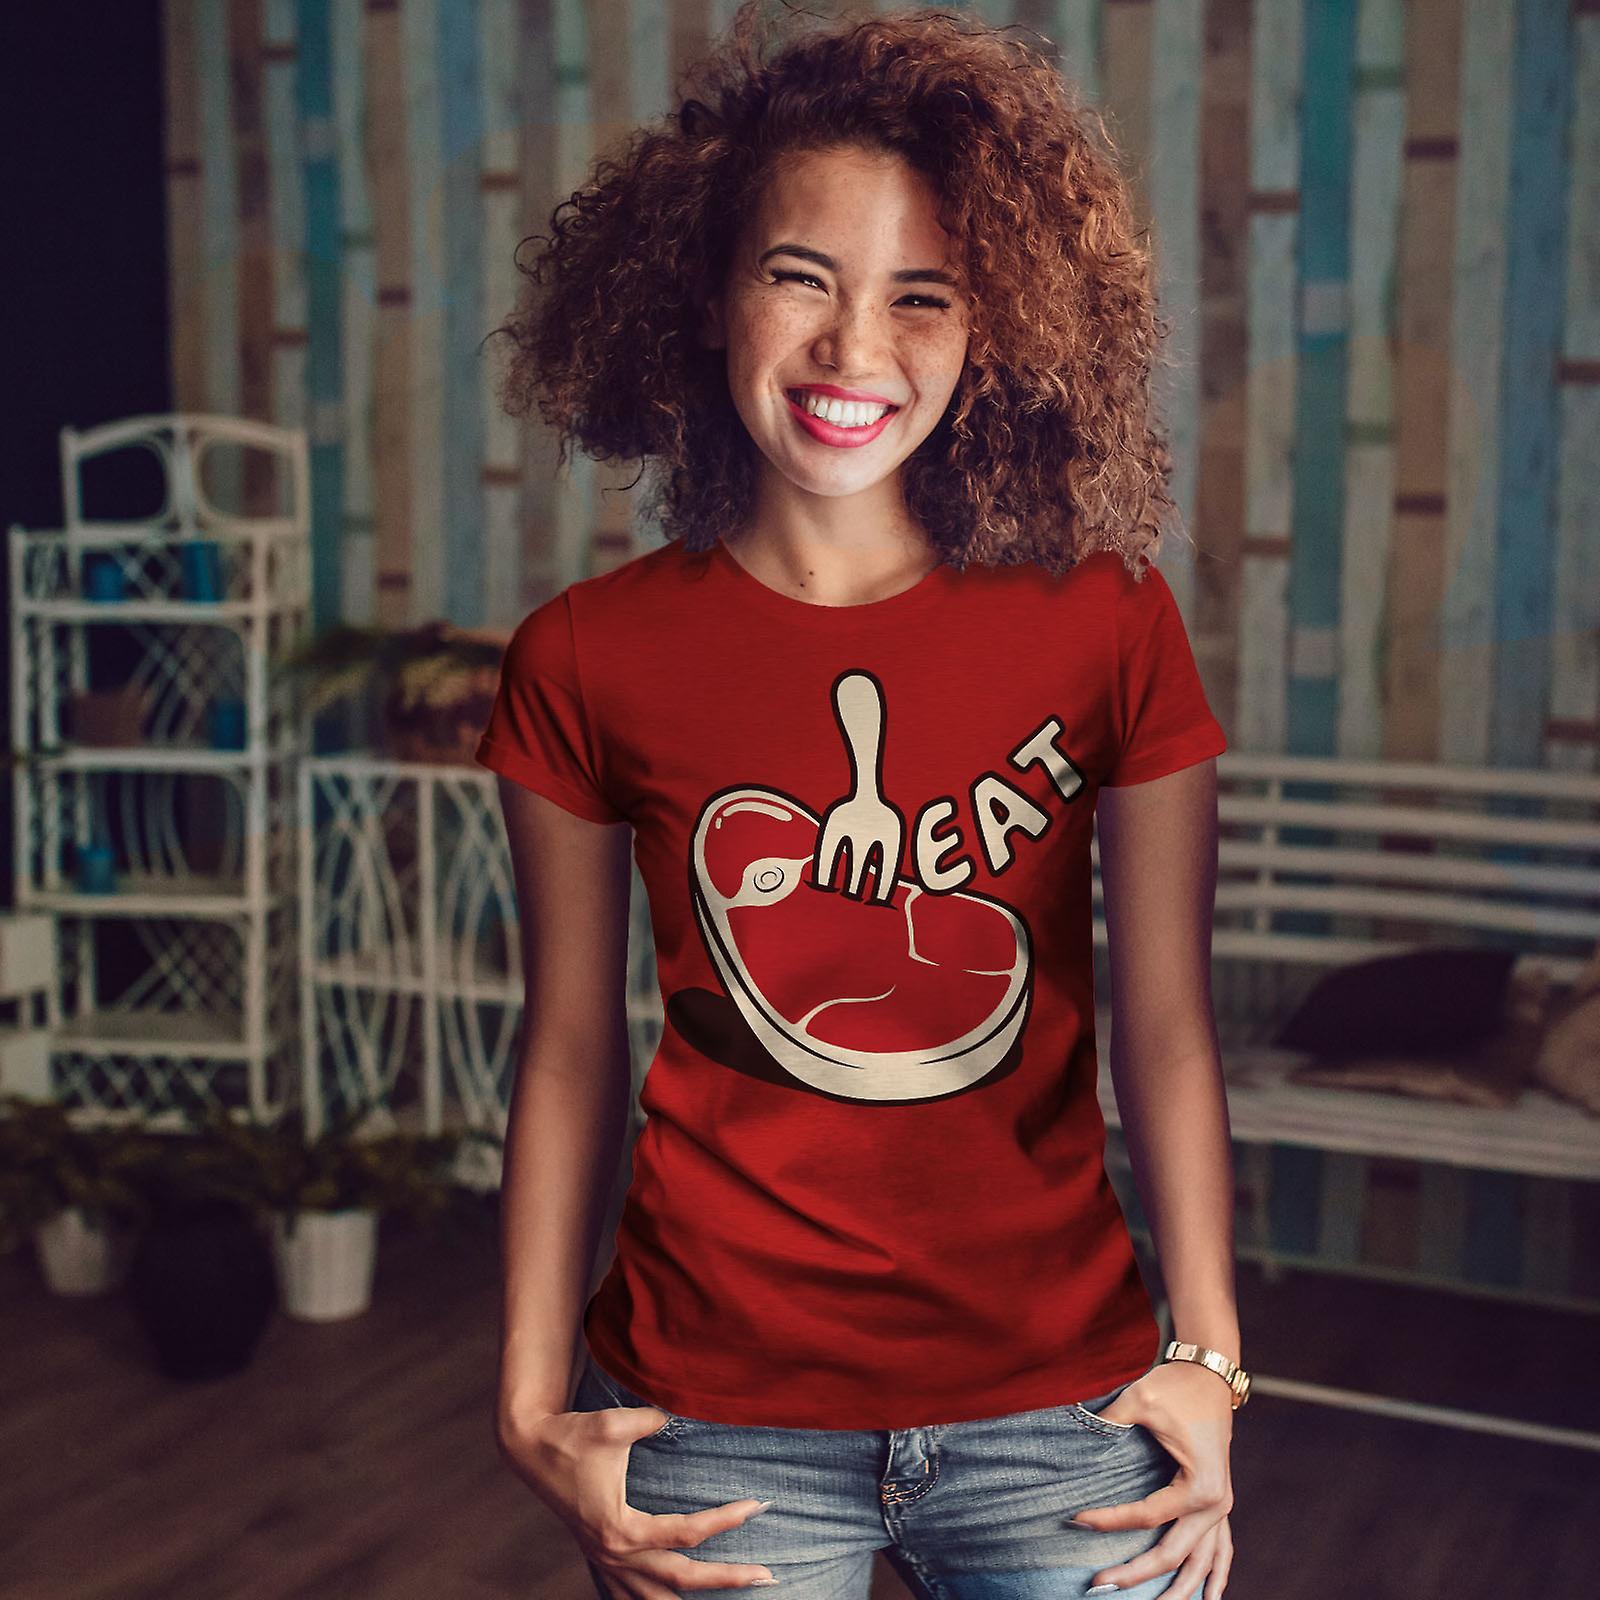 La viande Steak RedT-chemise femme | Wellcoda